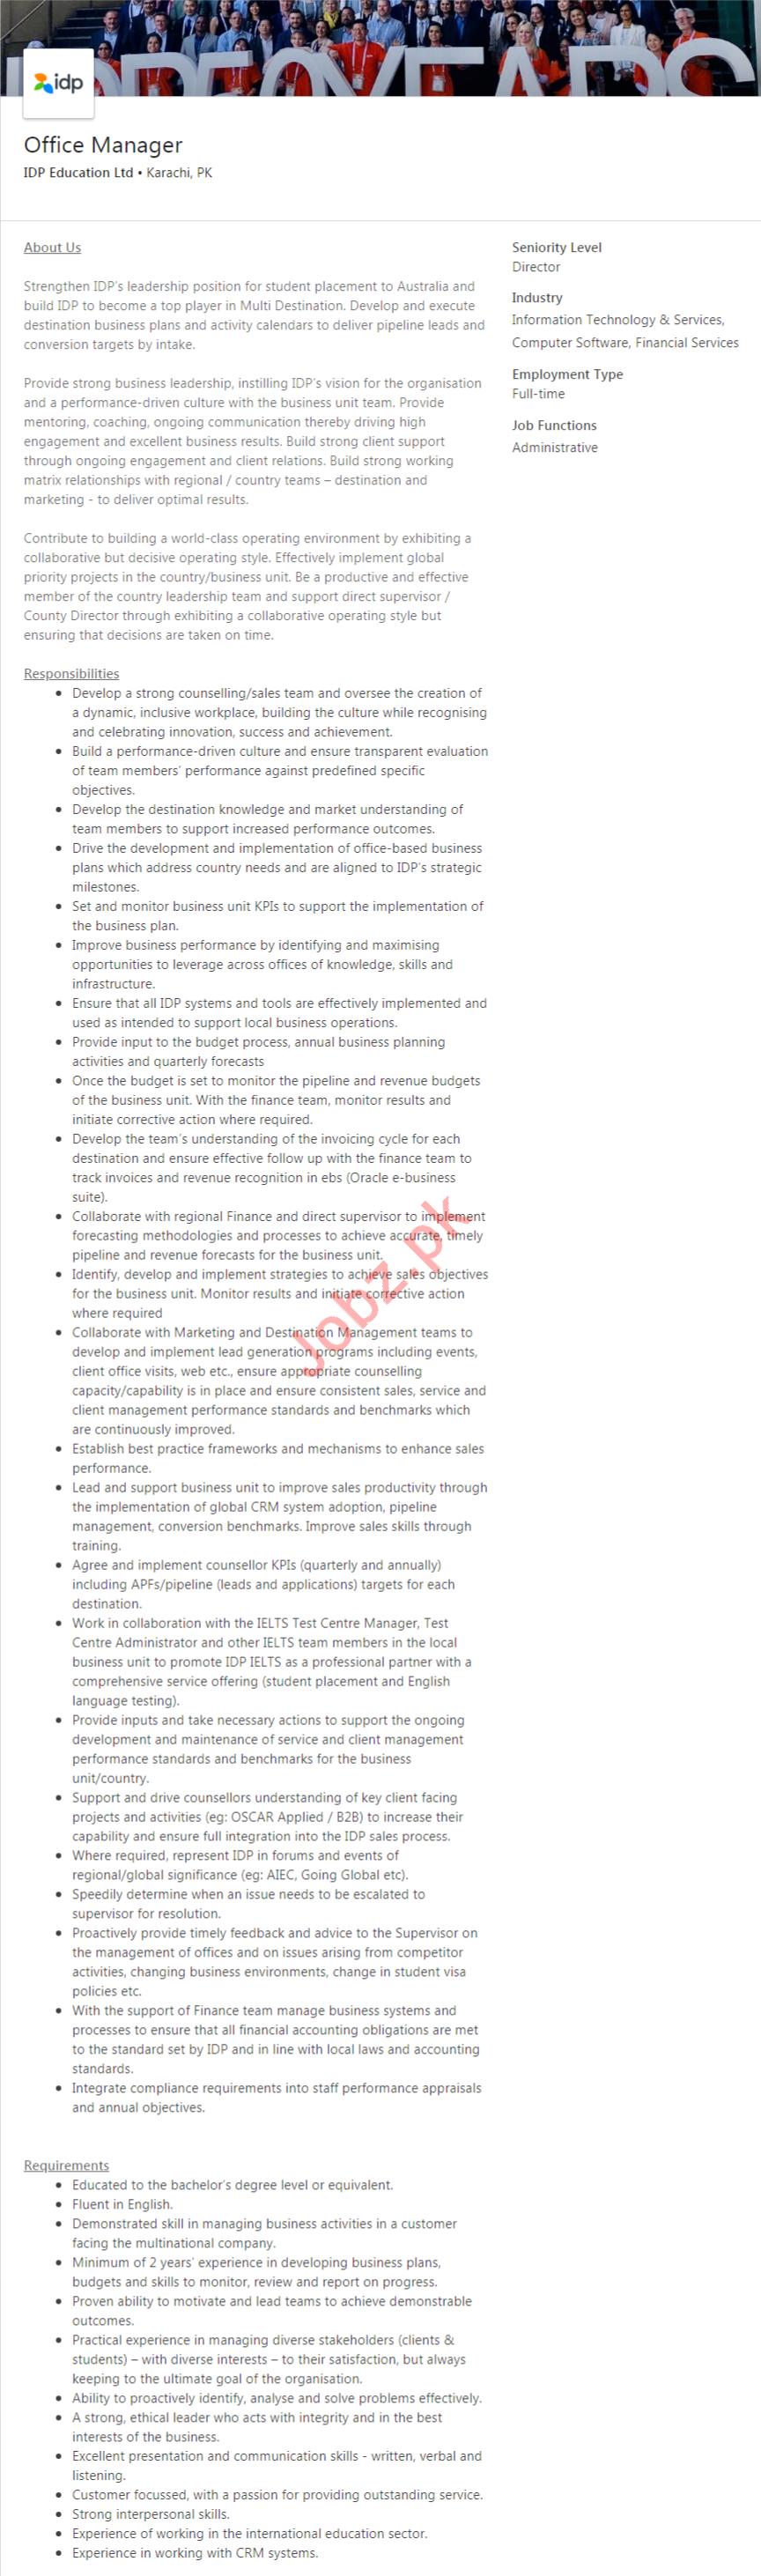 Office Manager Job 2020 in Karachi